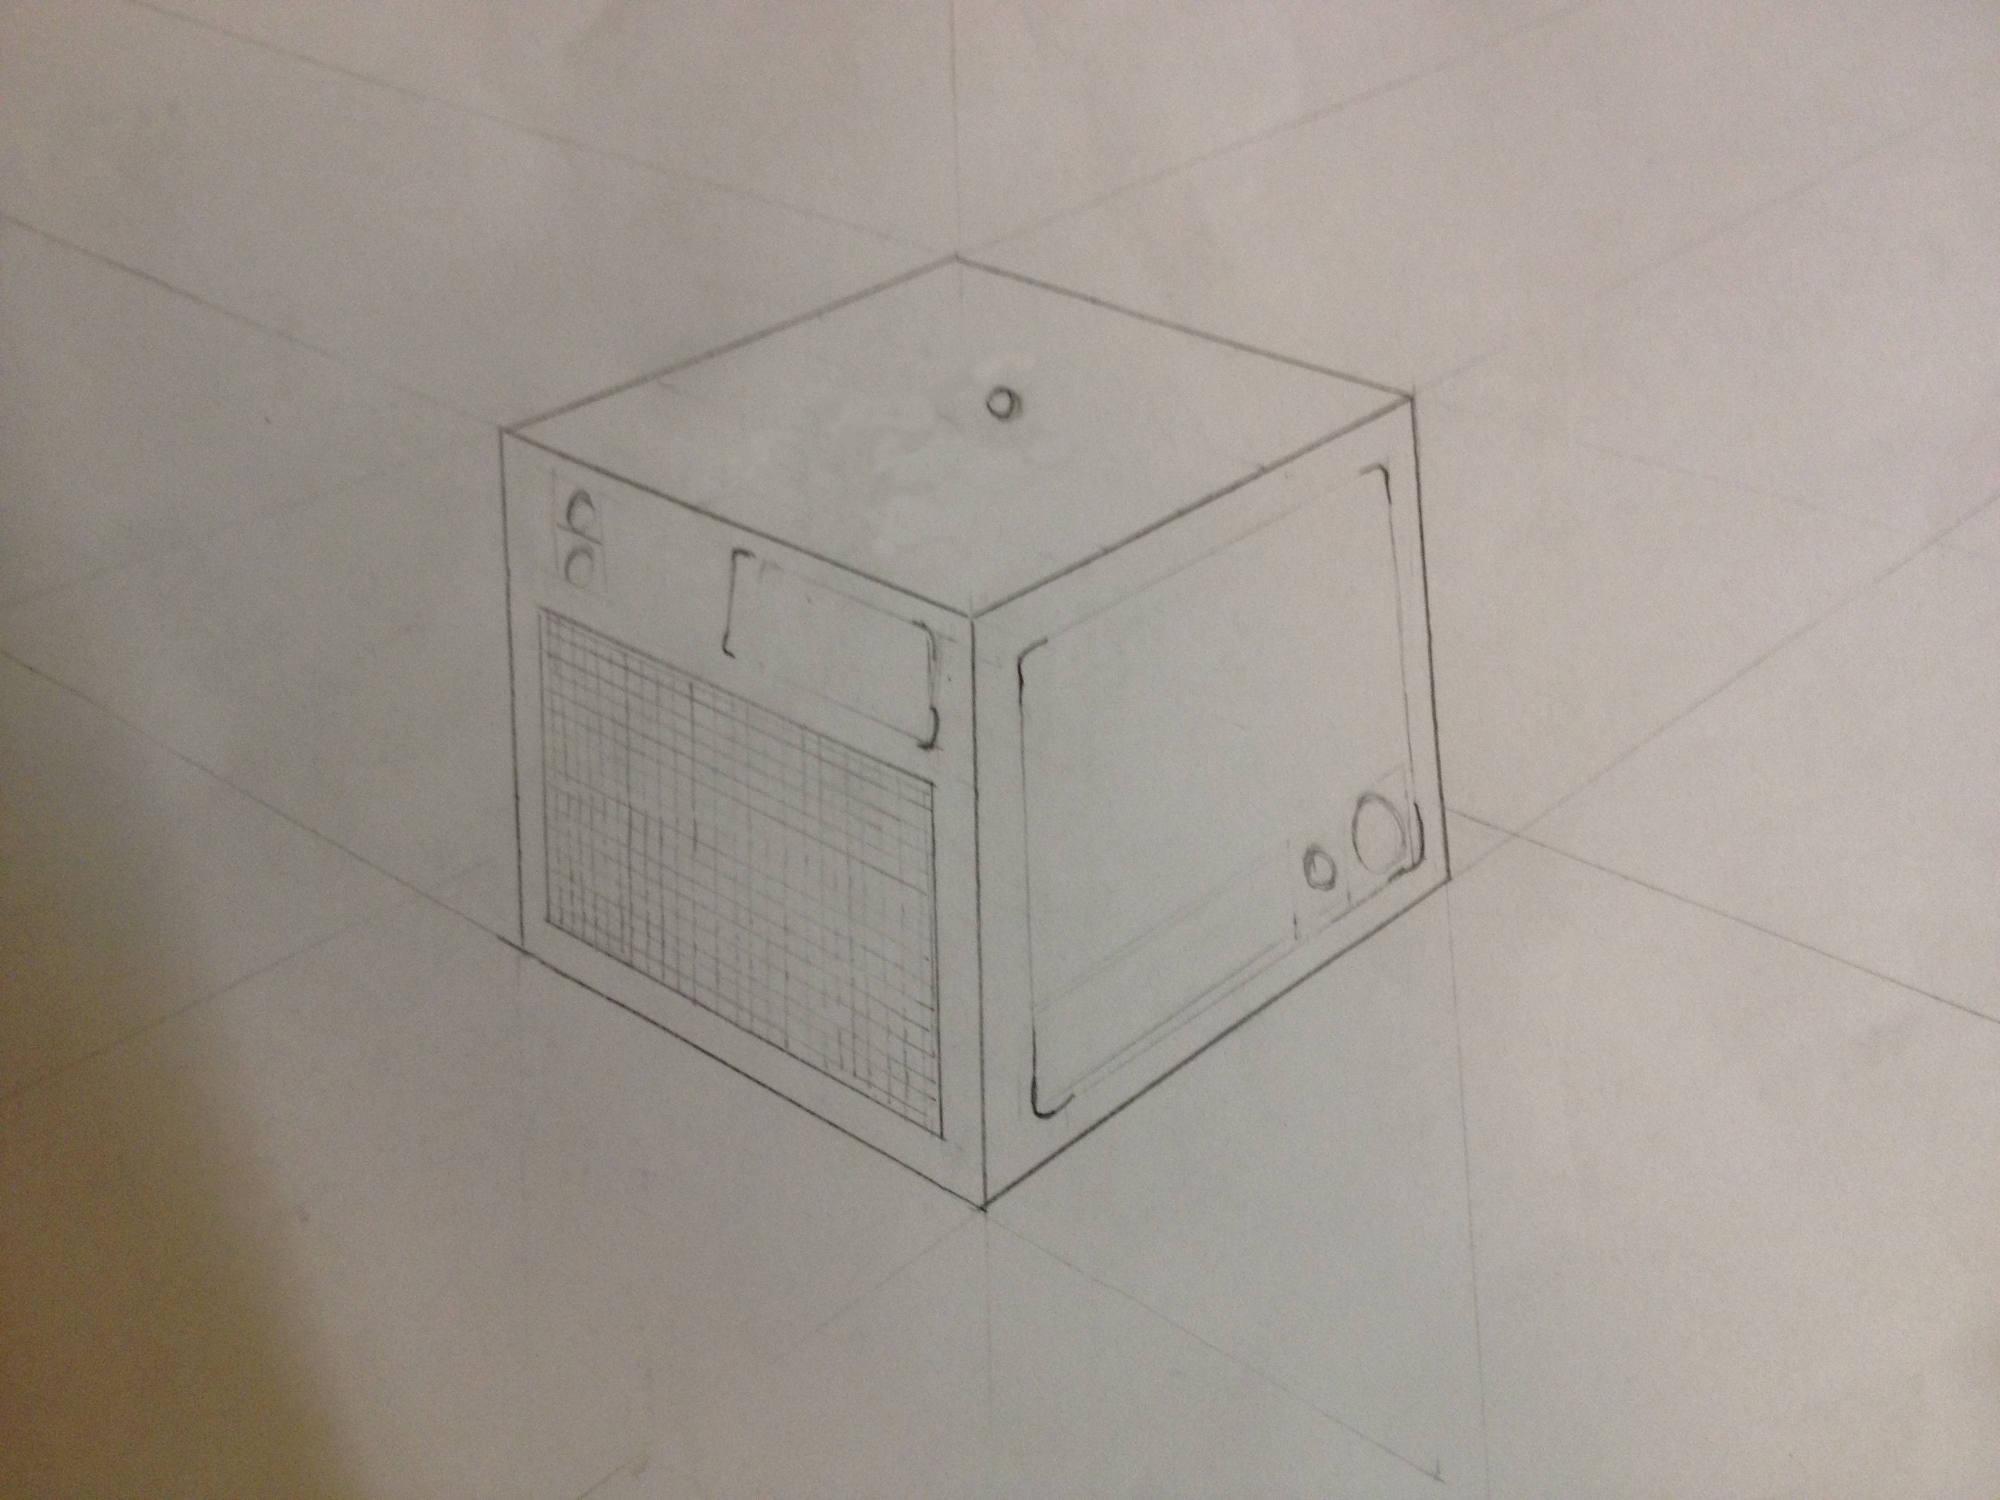 Persepective sketch